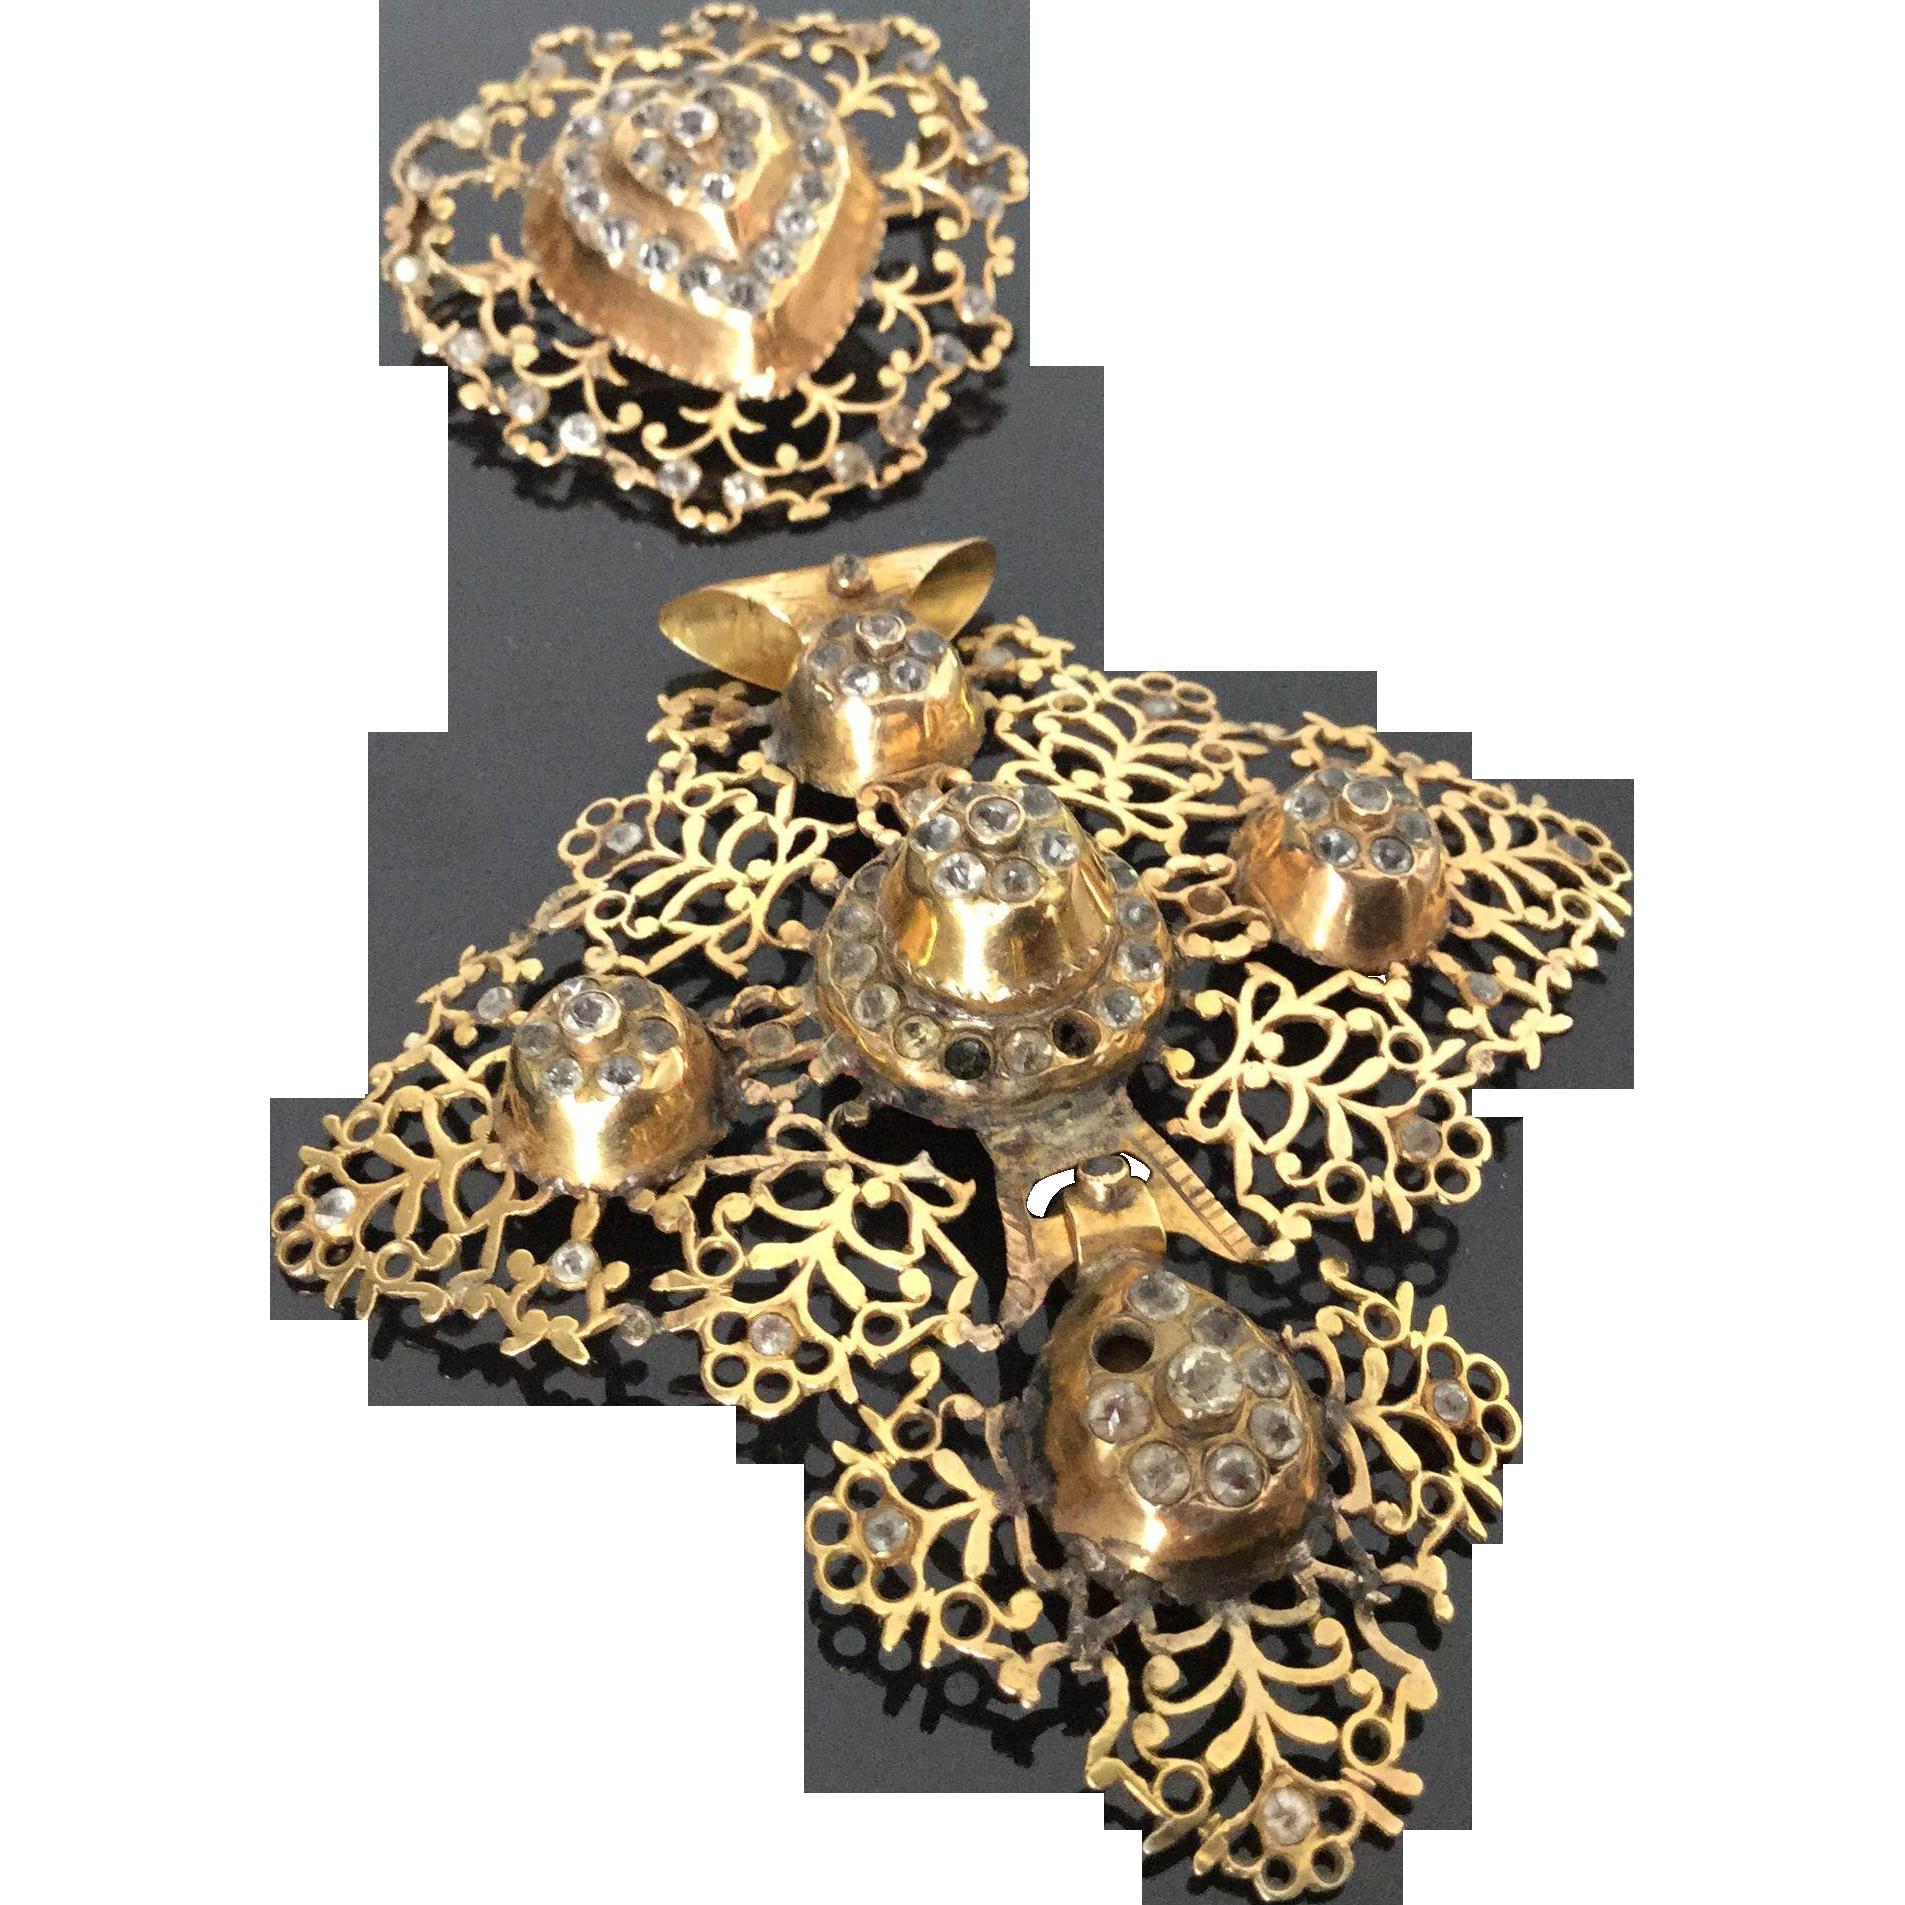 18th C French Georgian 18K Gold Filigree Cross with Rhinestones and its Brooch Circa 1750